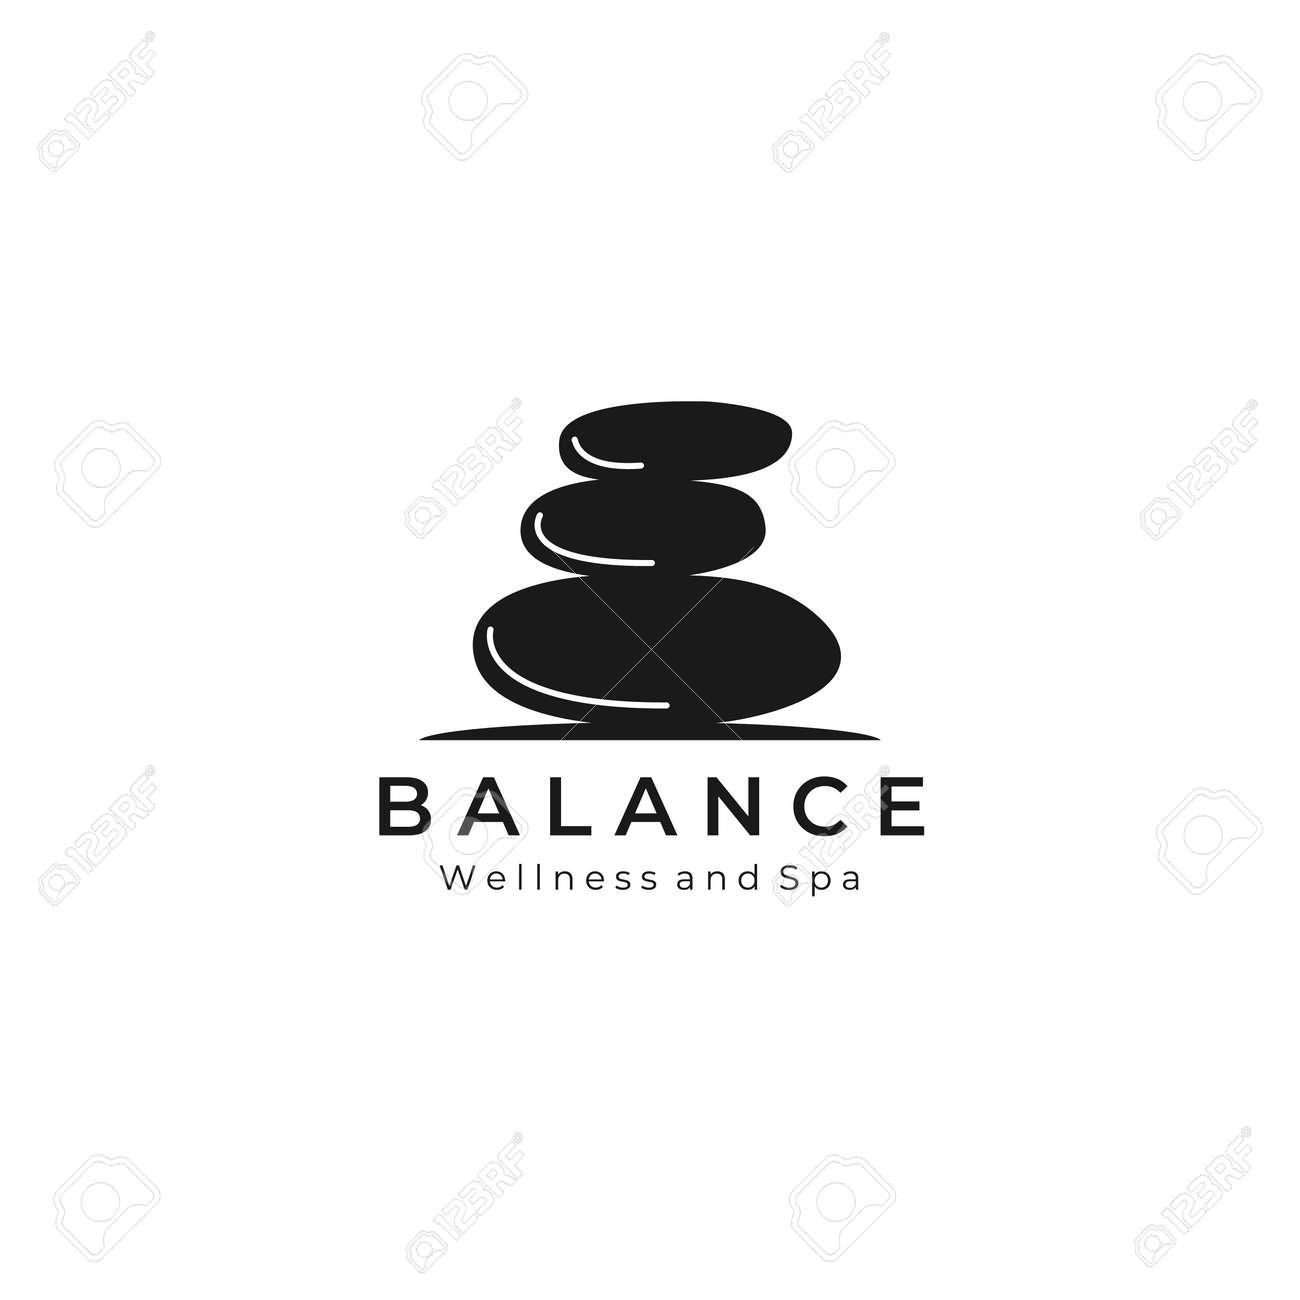 balance stone vintage logo vector illustration template design - 164869297